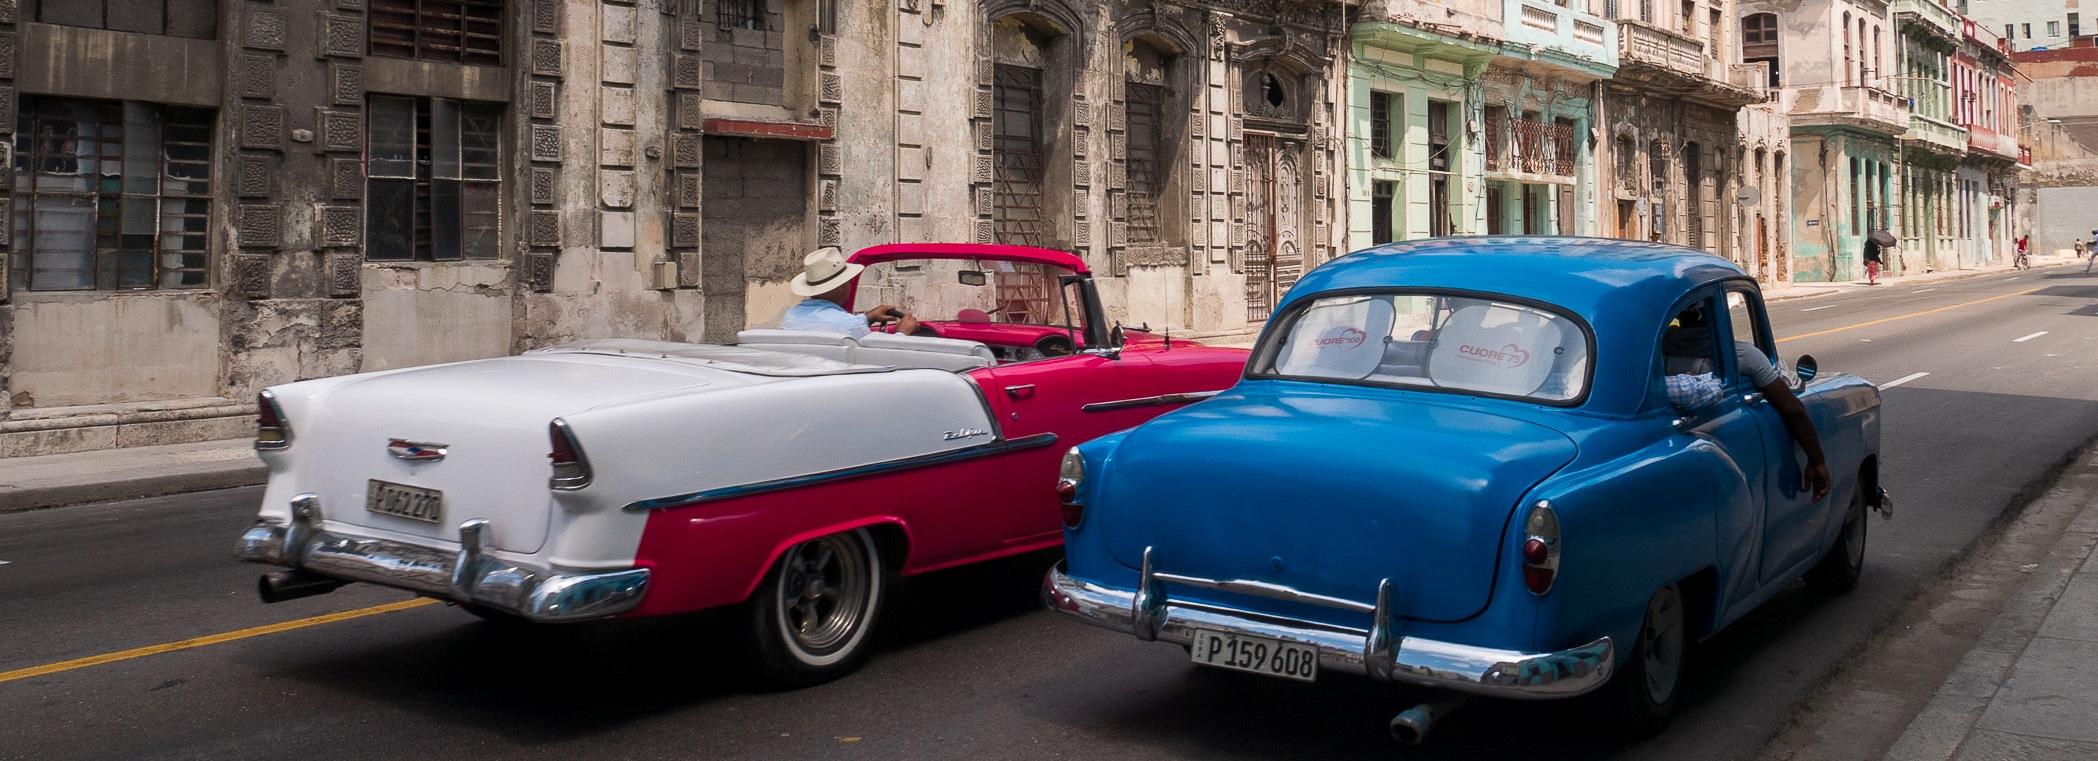 Samochody Kuba (8 of 1) 2